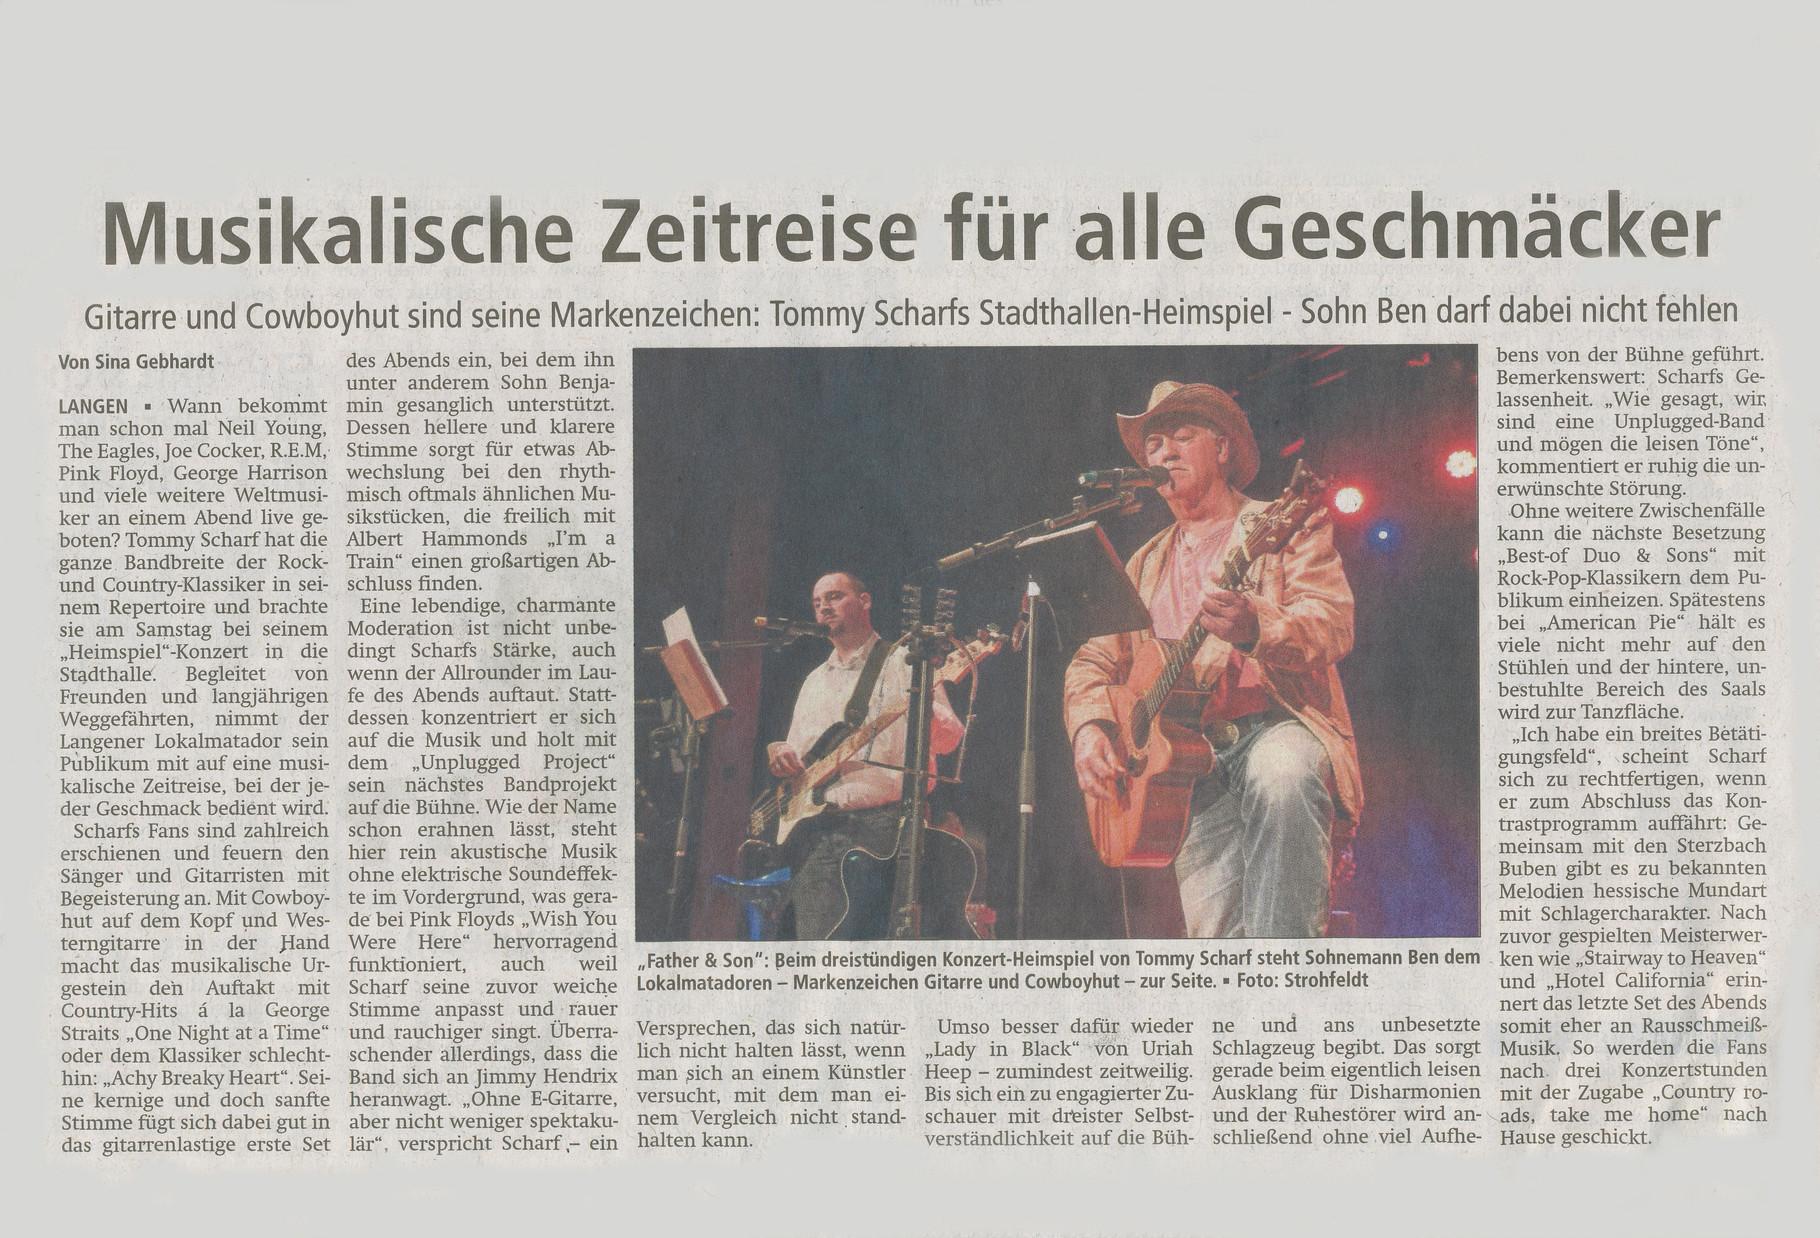 Offenbach Post, 14. März 2016